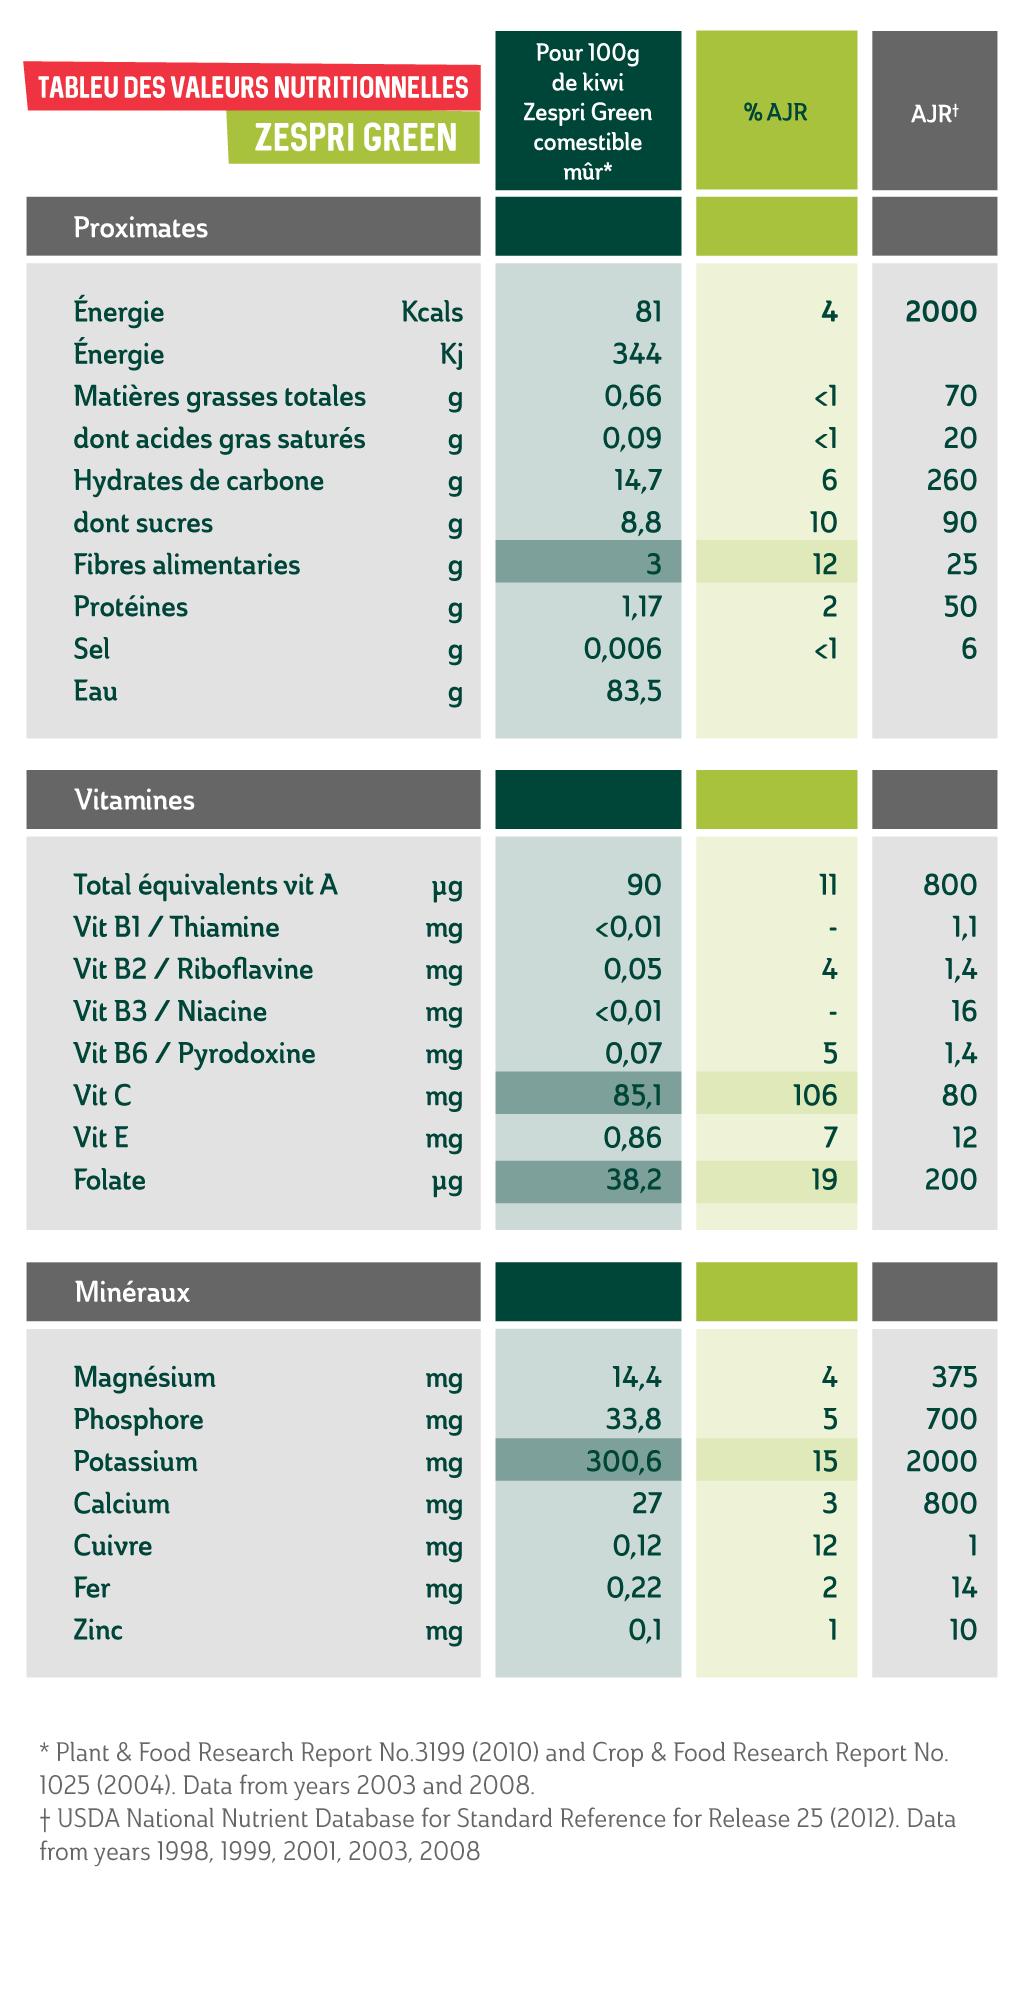 2.1.b-Zespri-Green-Nutrient-table_FR.png